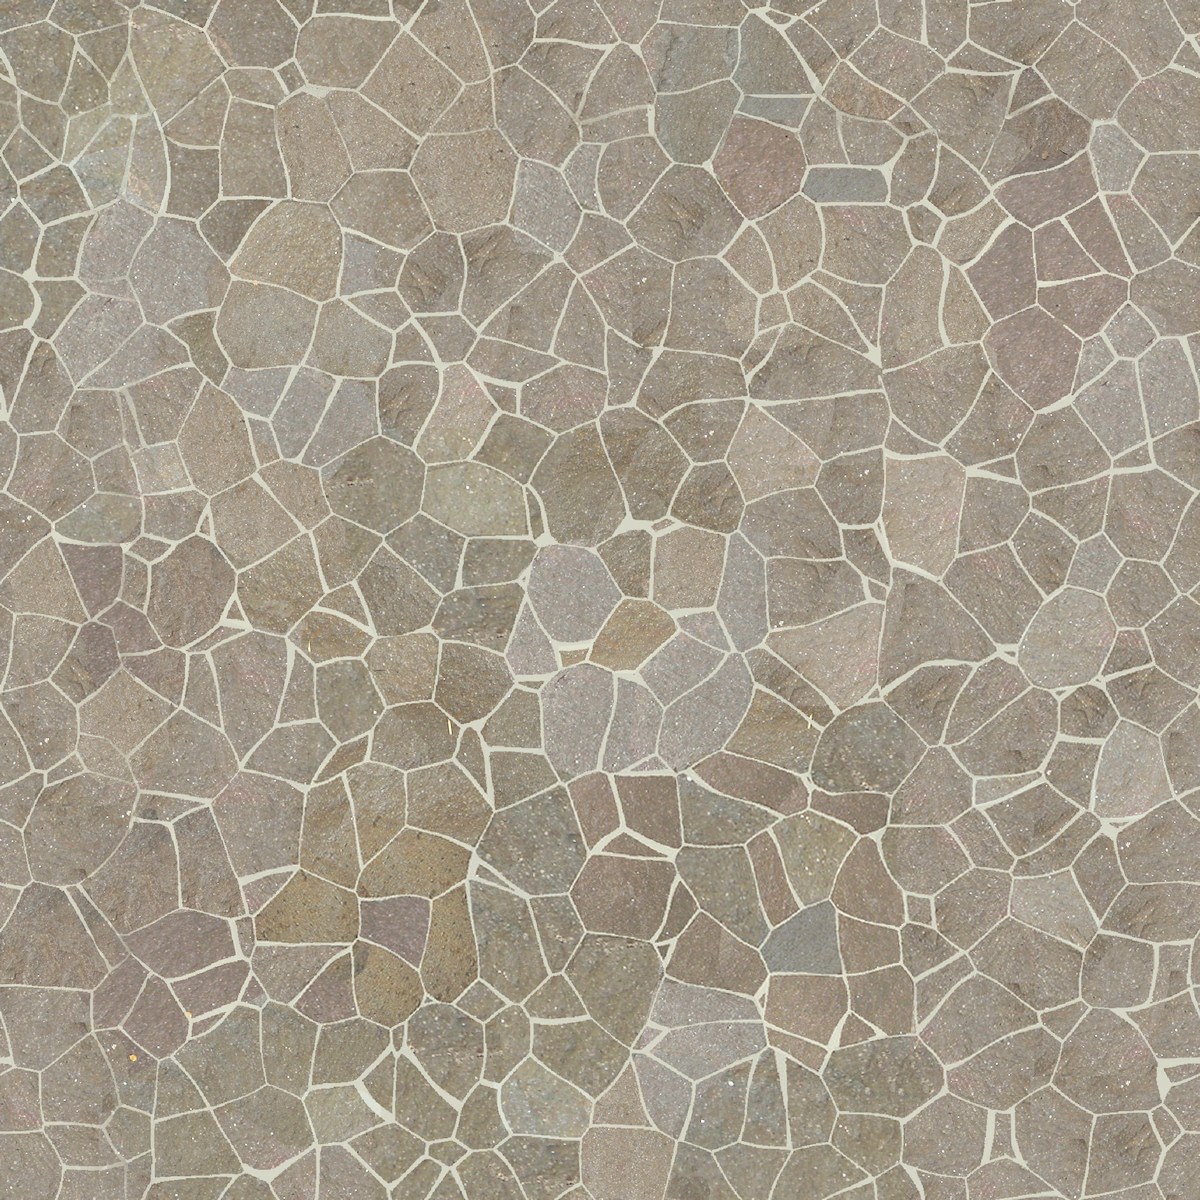 Swtexture Free Architectural Textures Crazy Stone Tiles